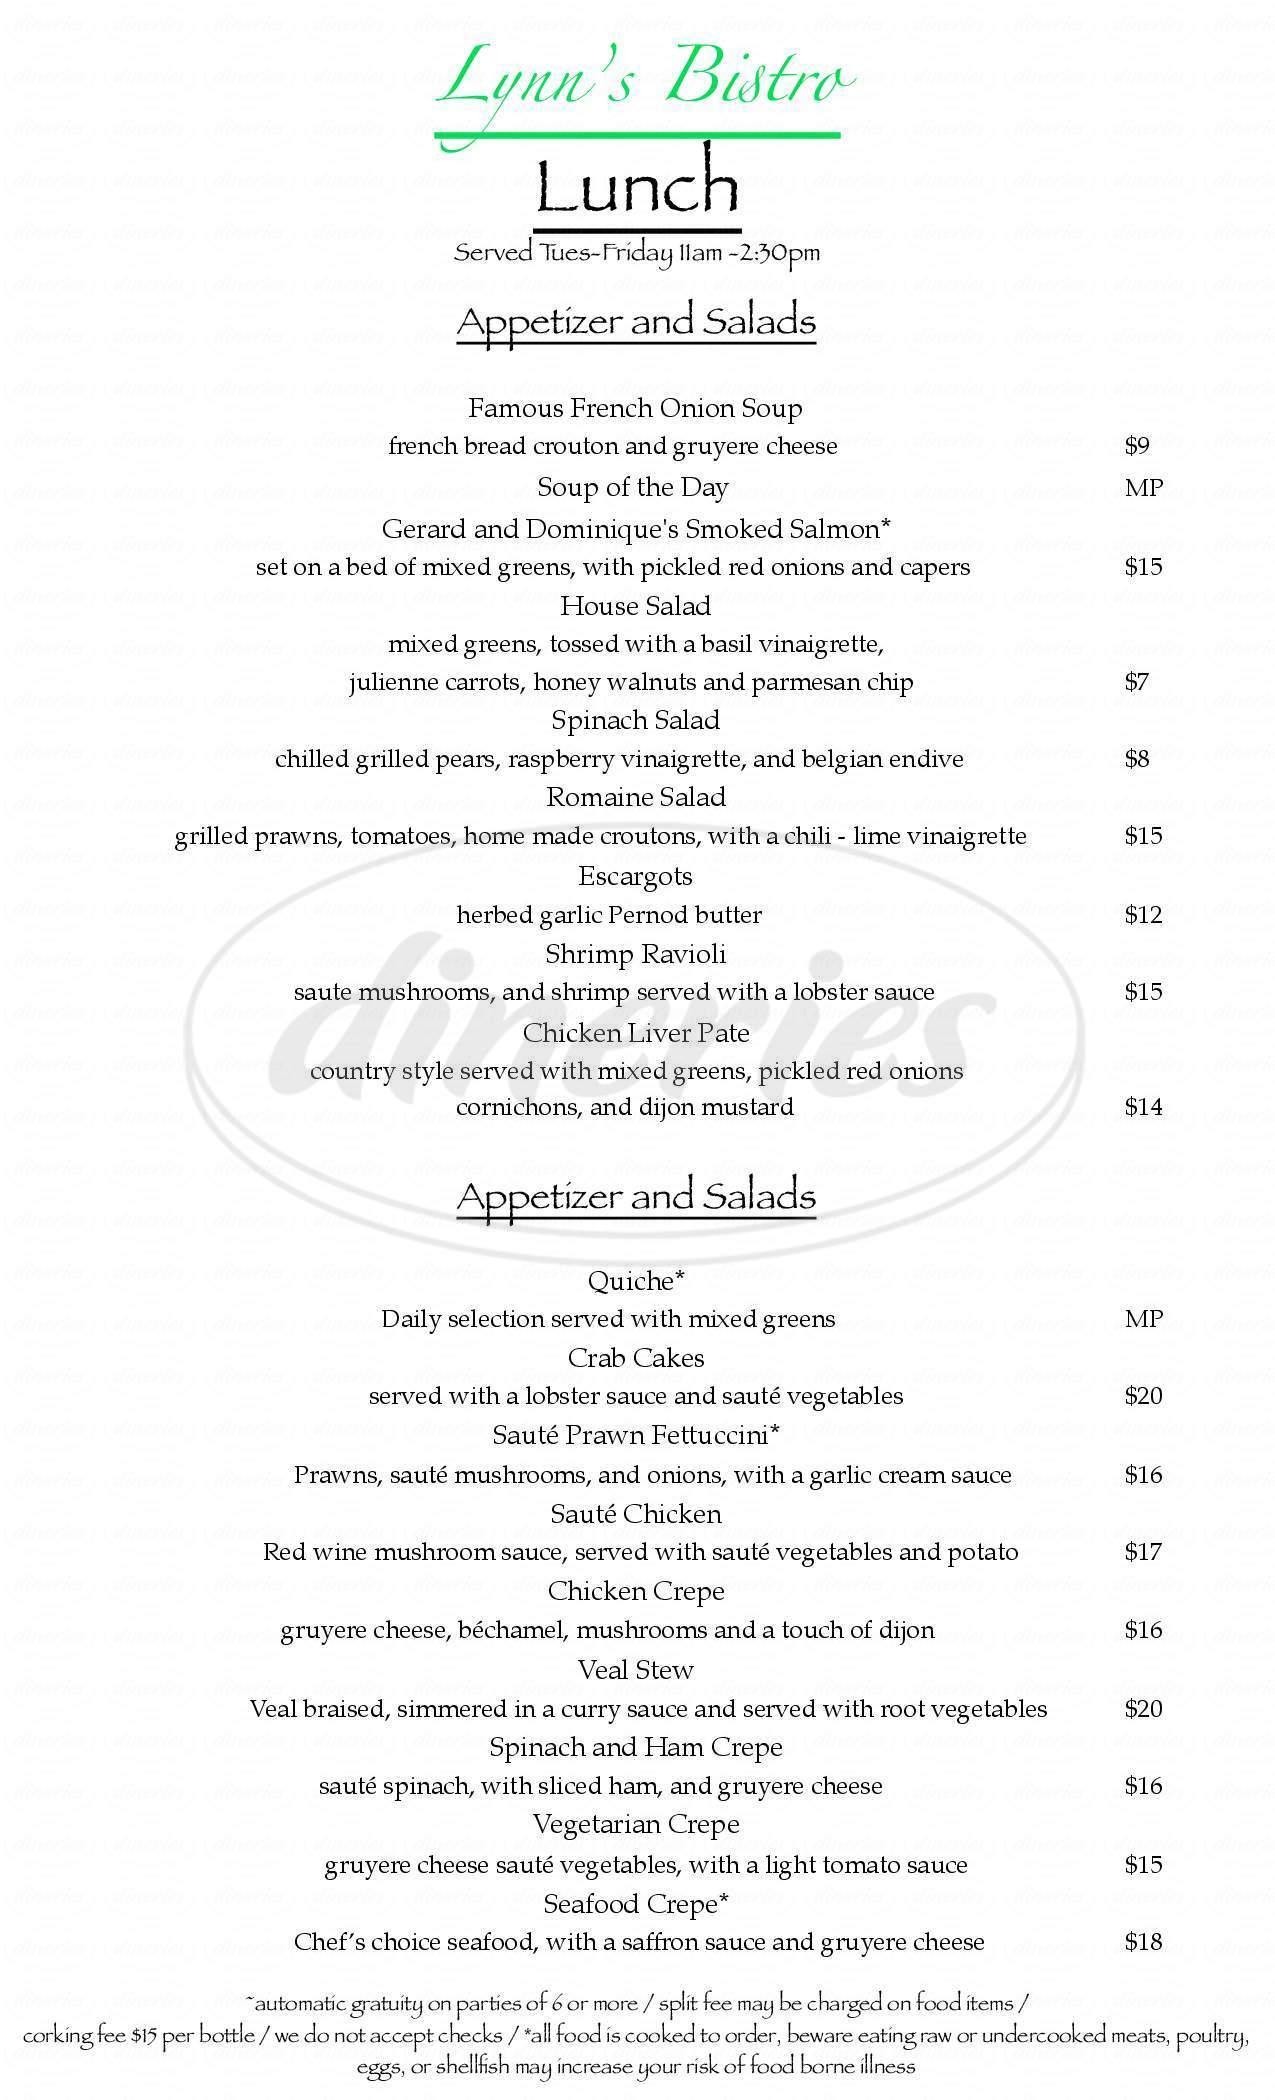 menu for Lynn's Bistro